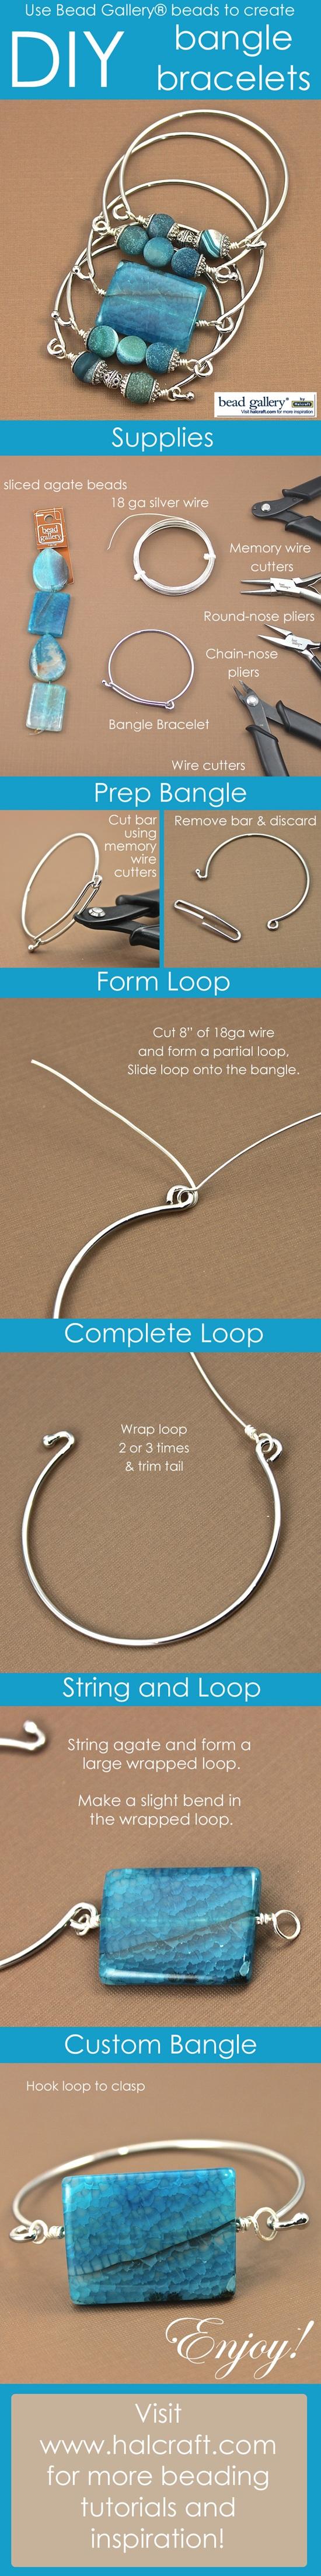 10 Easy & Beautiful Bracelet Tutorials